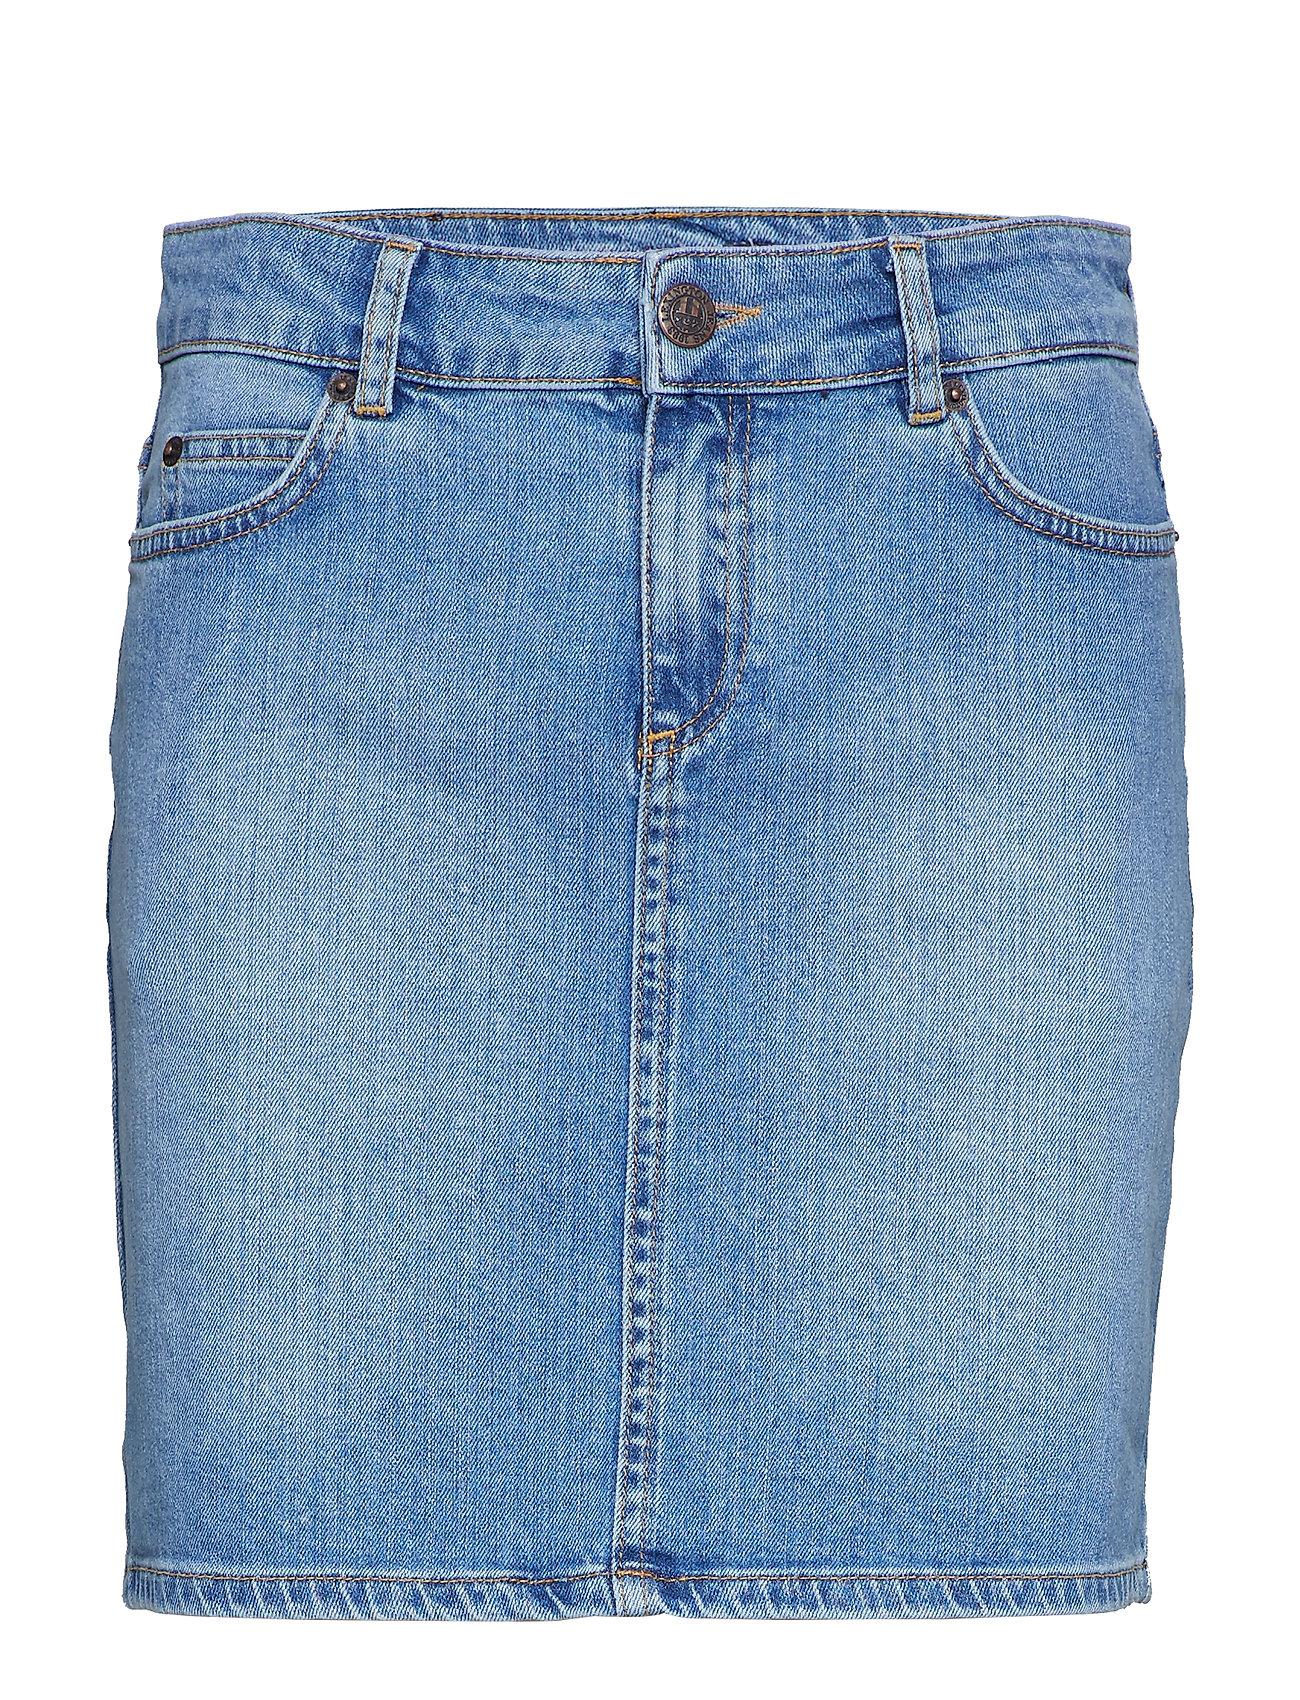 Lexington Clothing Alexa Blue Denim Skirt - LT BLUE DENIM